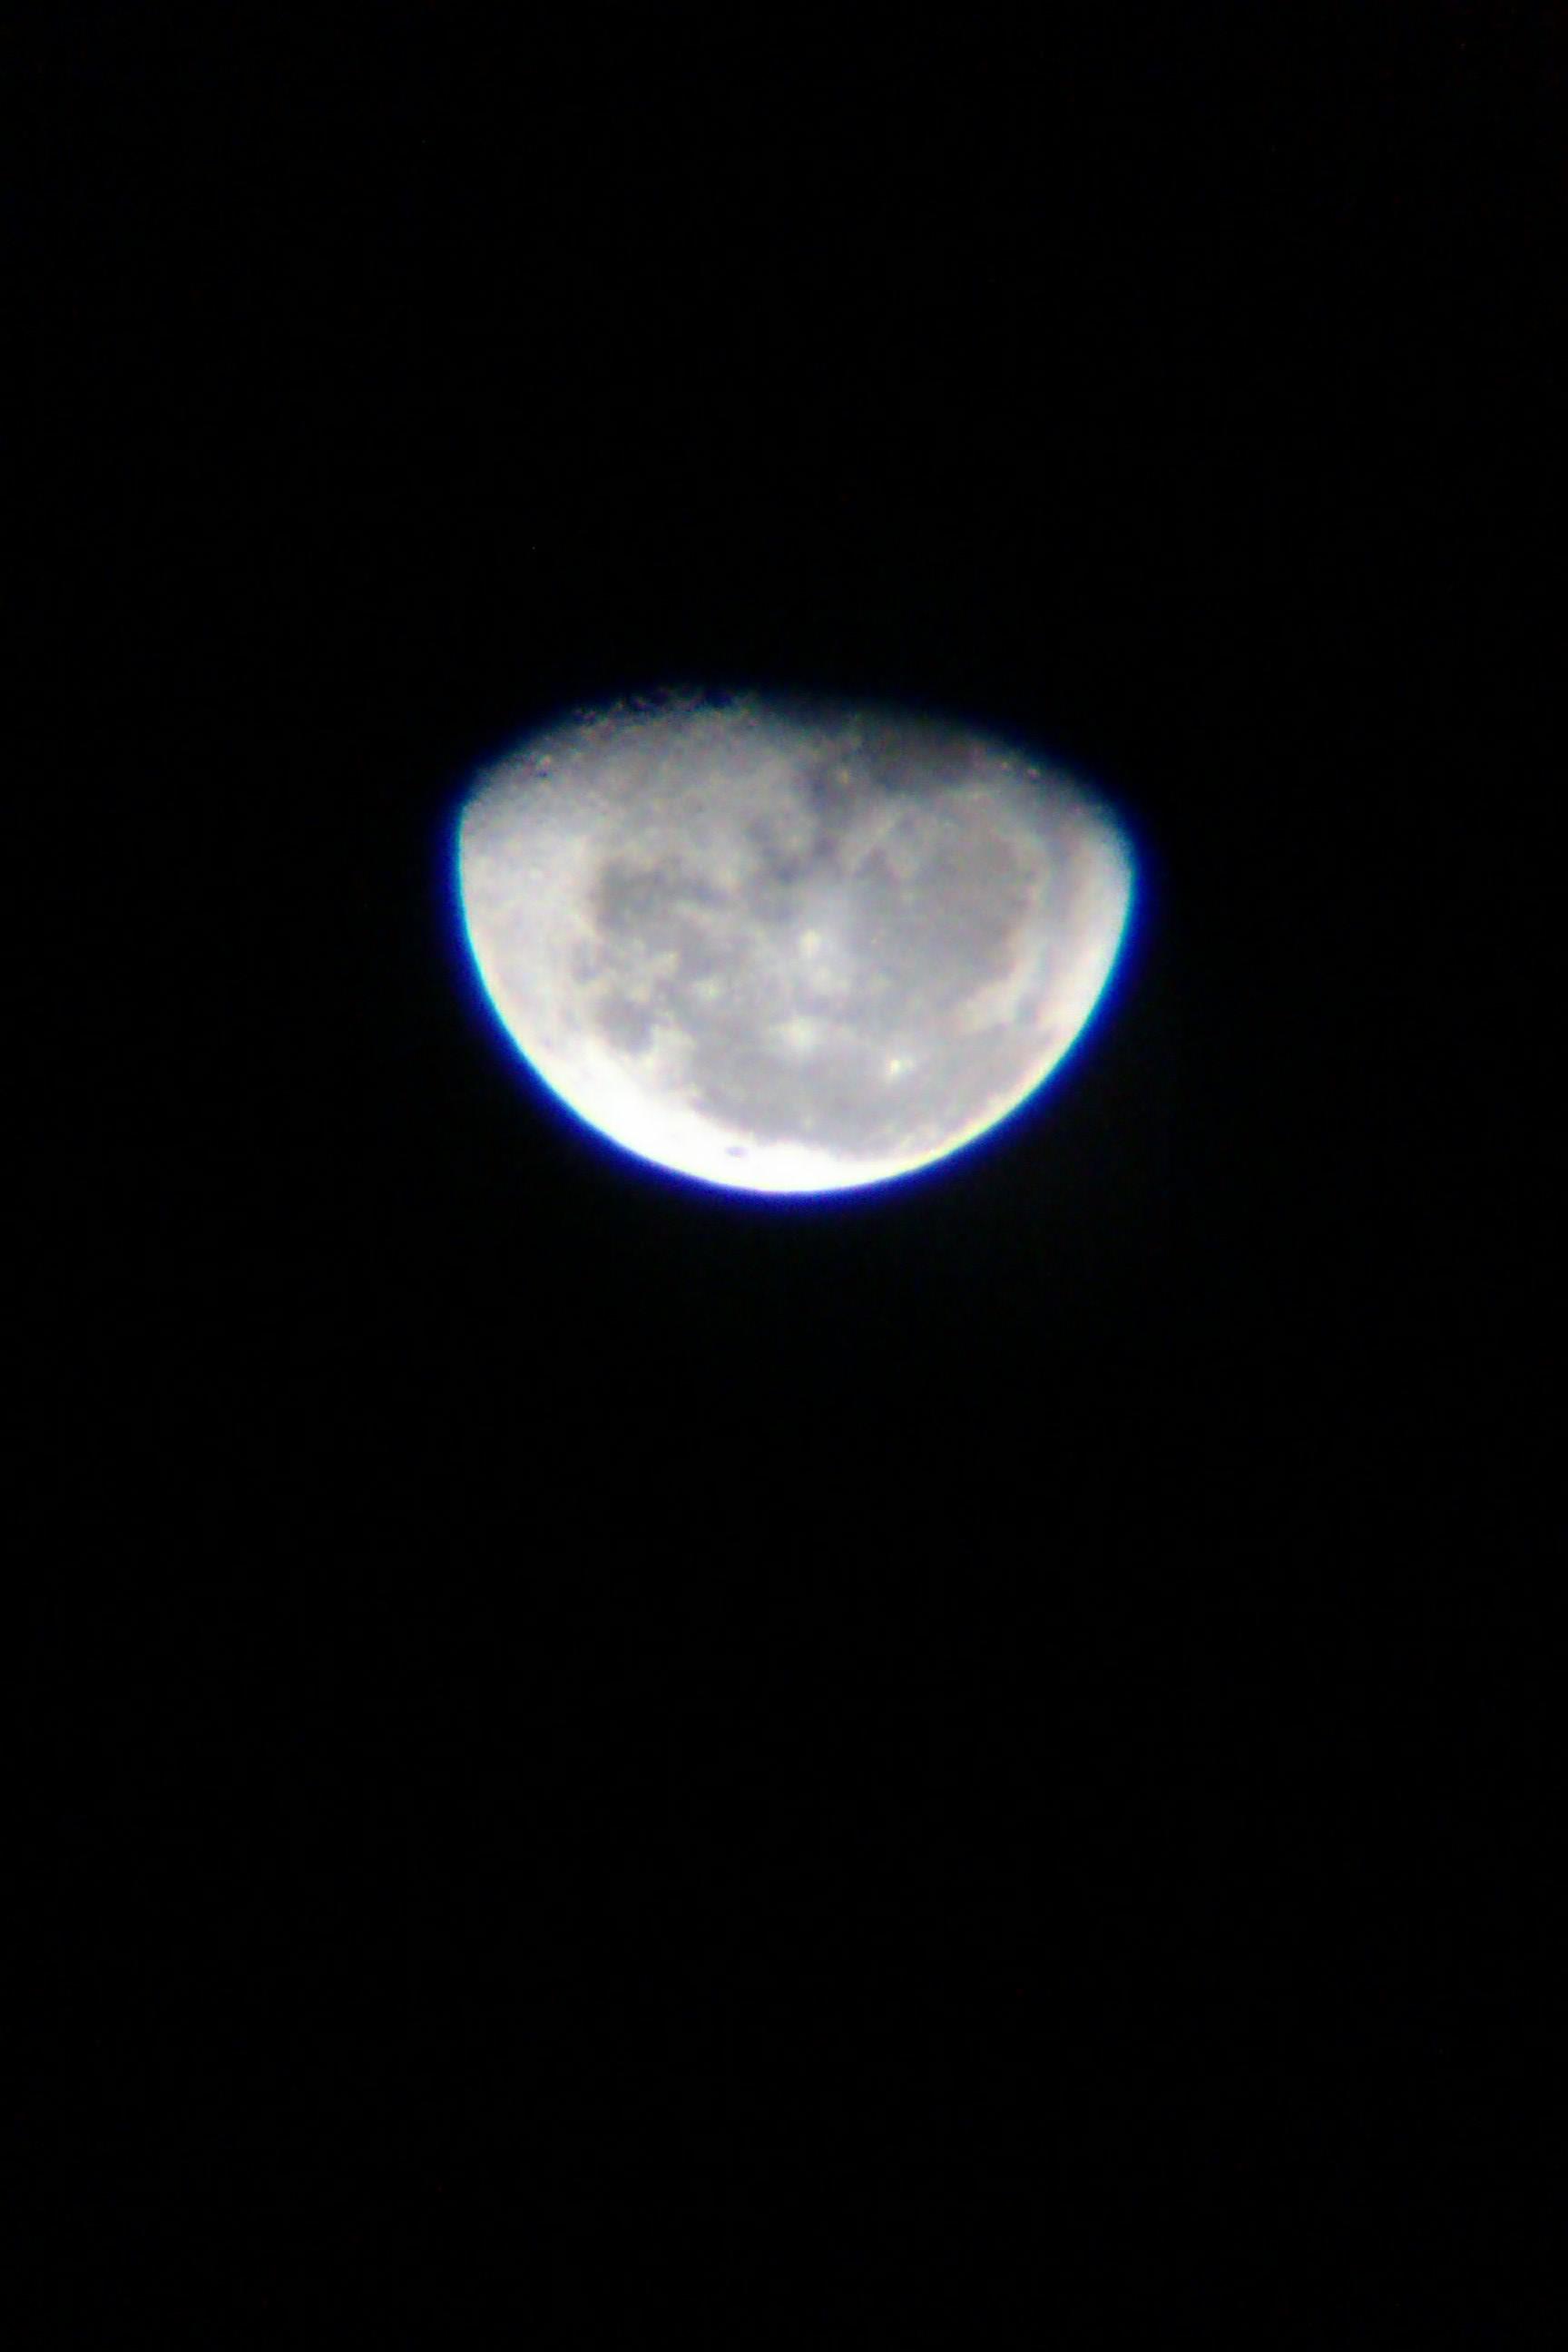 myblog.9e.cz/teleskop/M2.jpg